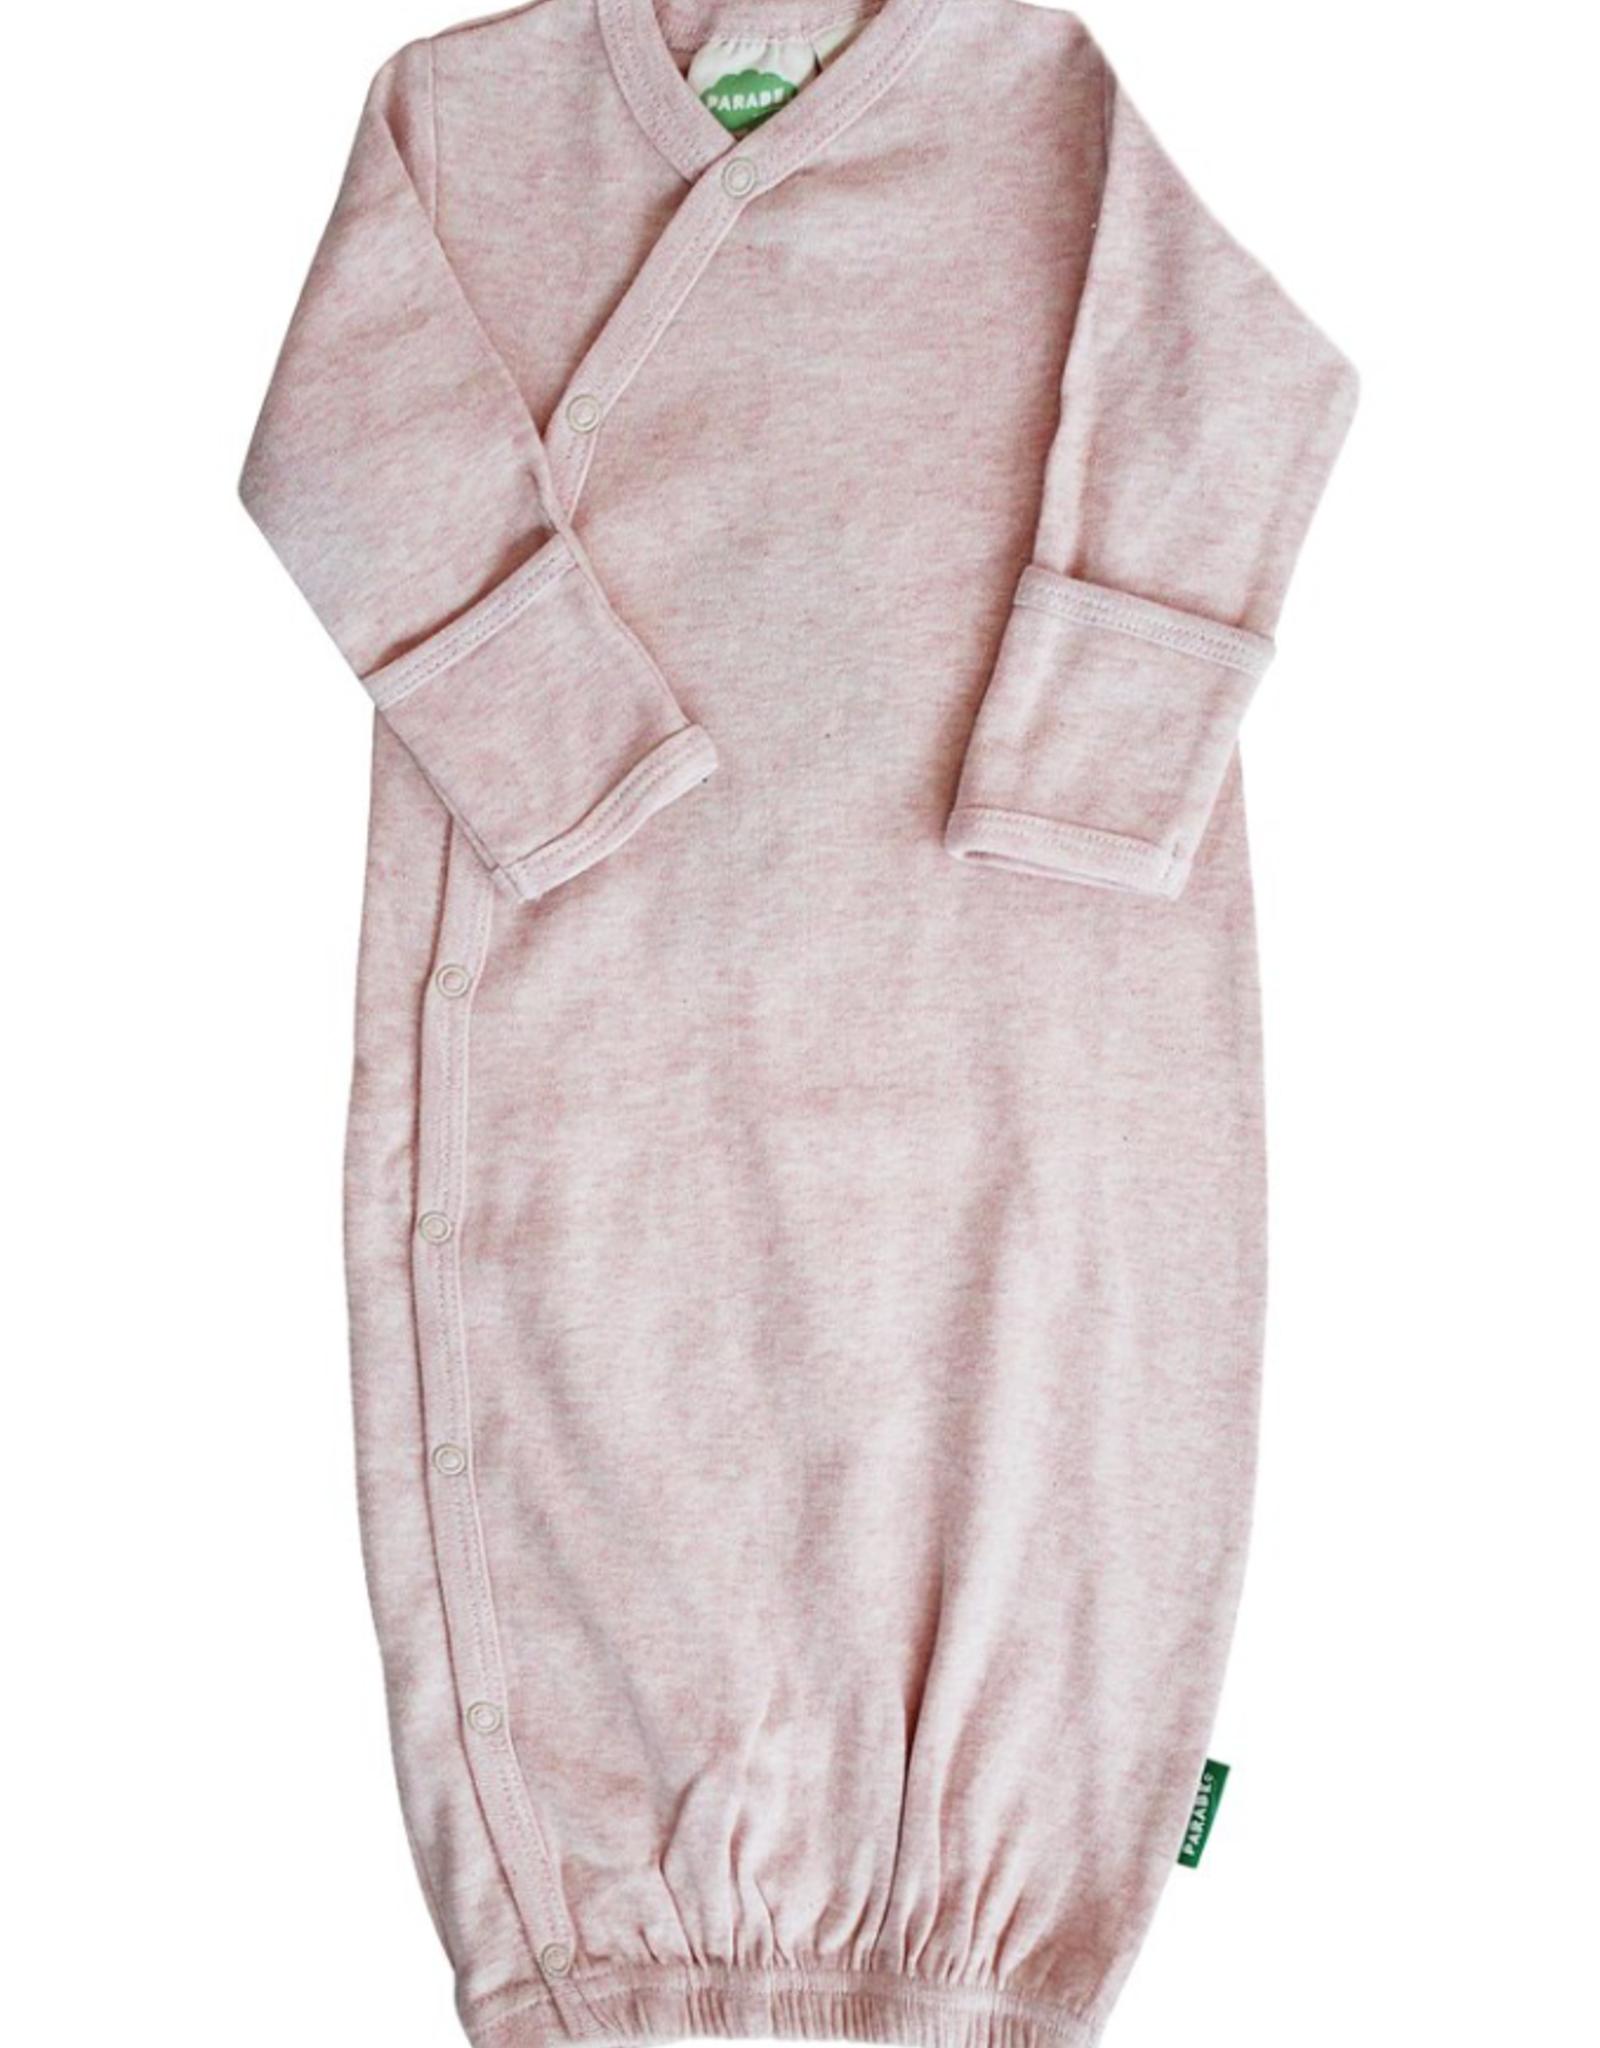 Parade Organics Kimono Gown - Essentials